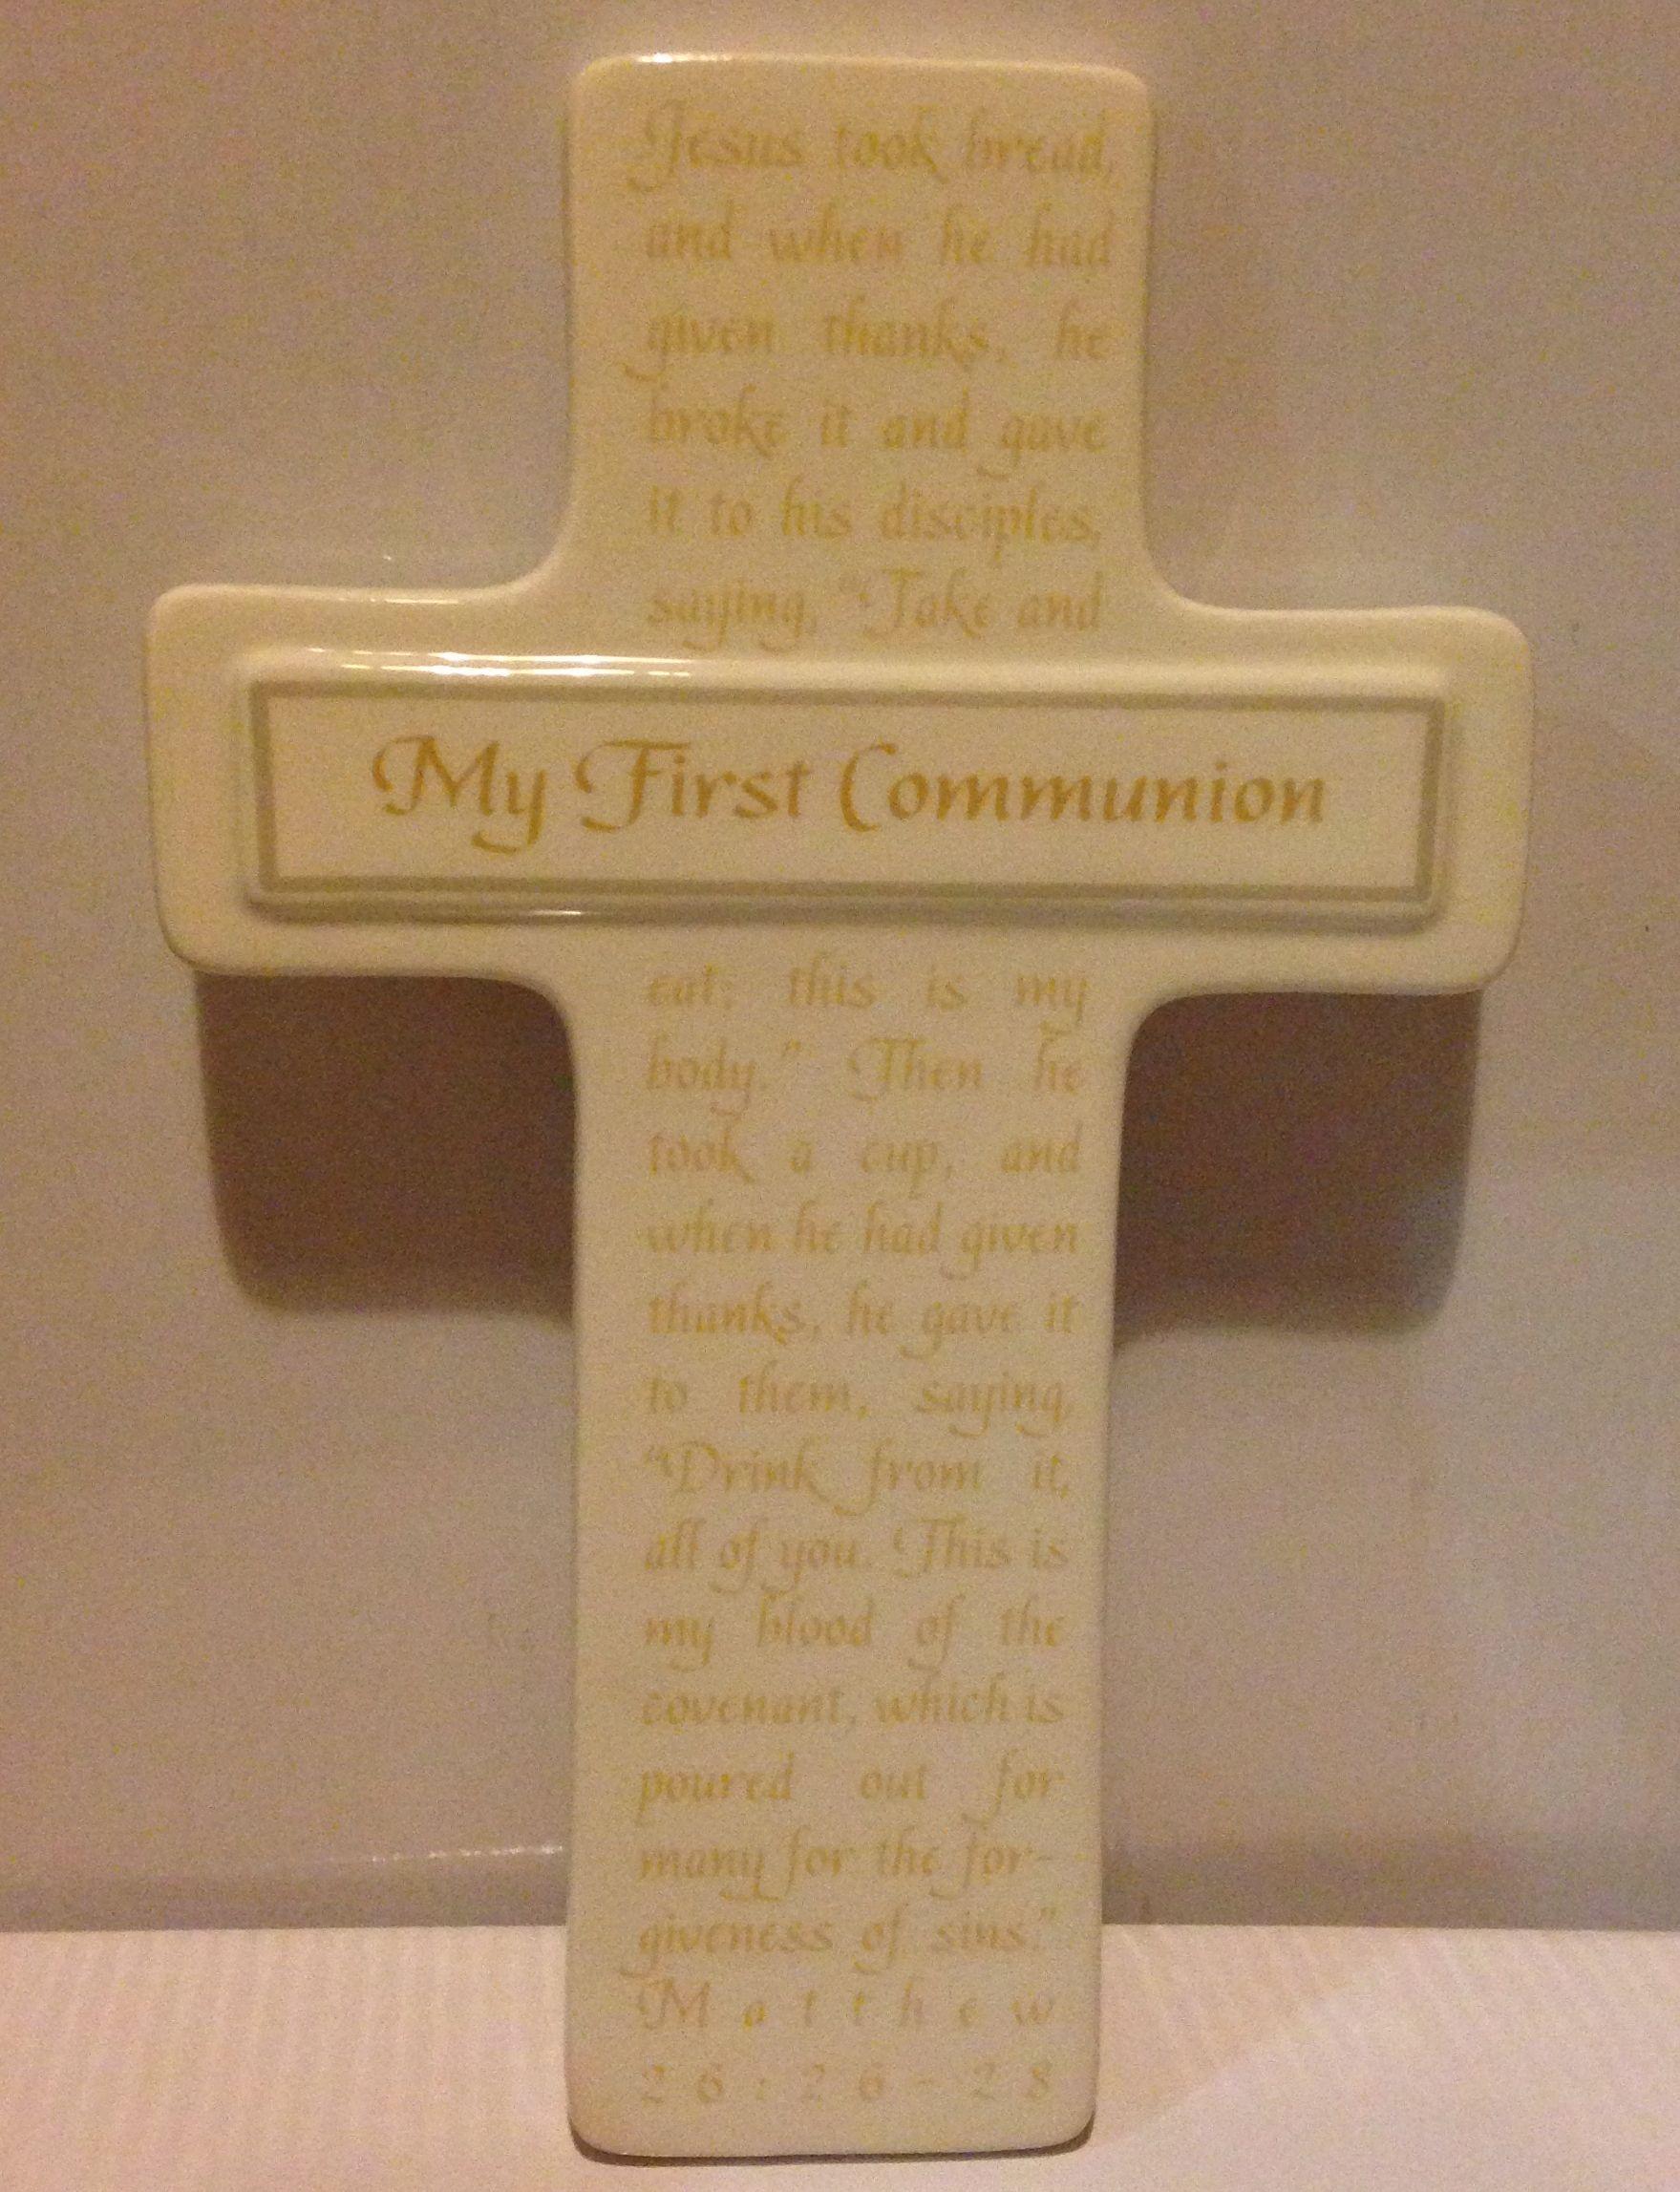 My First Communion Wall Cross first communion wall cross, holy eucharist cross, first communion gift, boy gift, girl gift, sacramental gift, 4047231